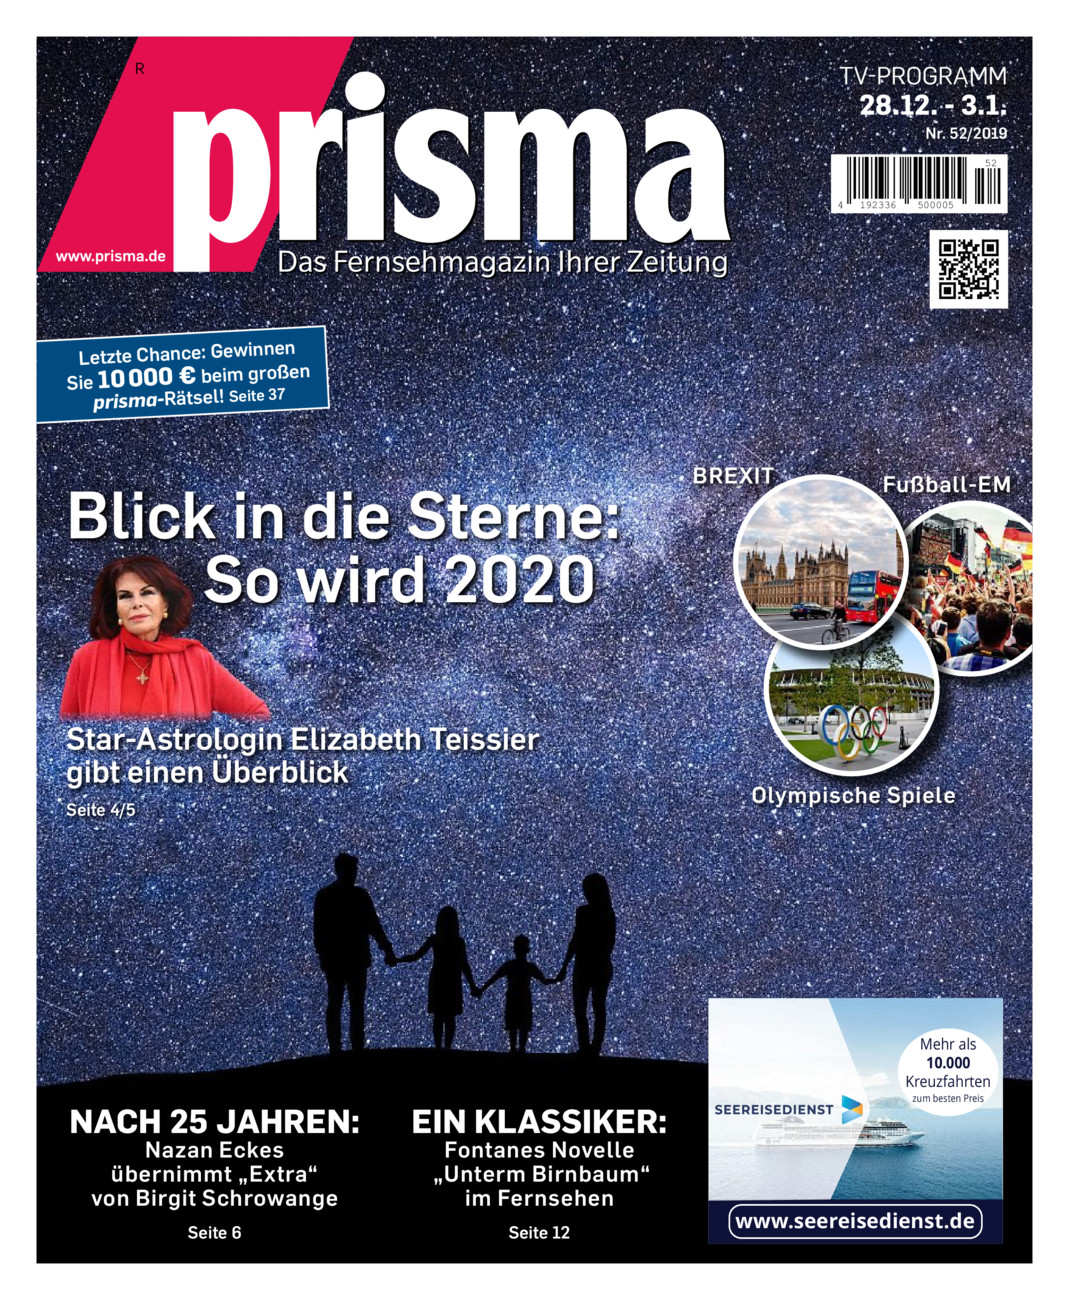 Prisma 28.12.-3.1.